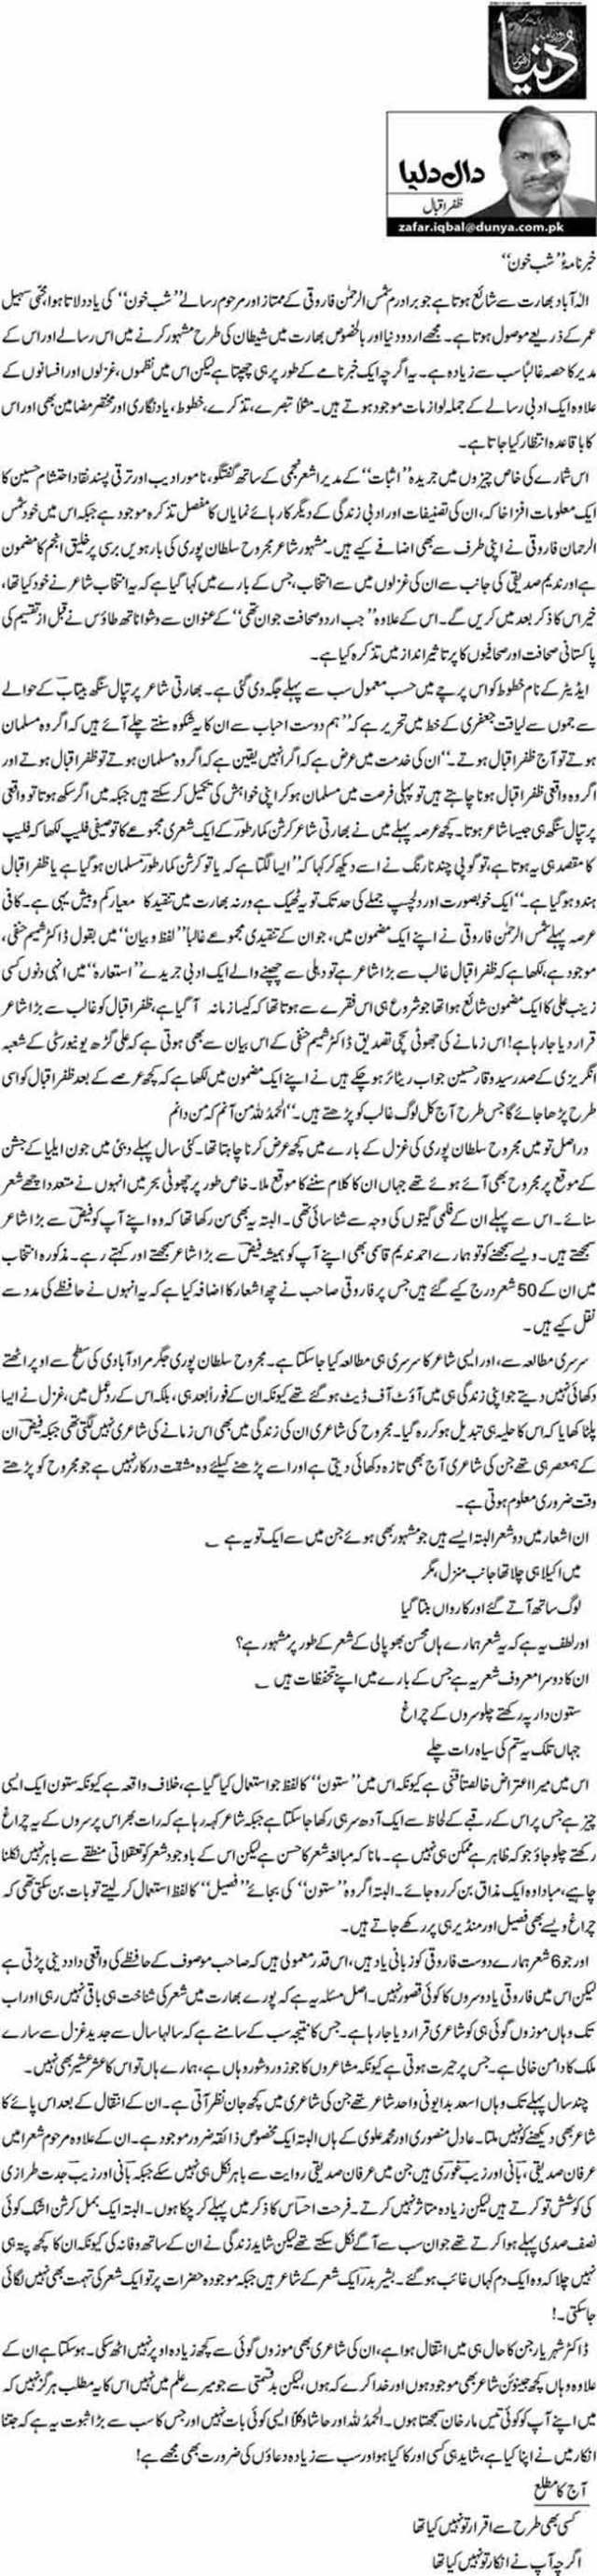 "Khabrnaama""Shabekhun"" - Zafar Iqbal"